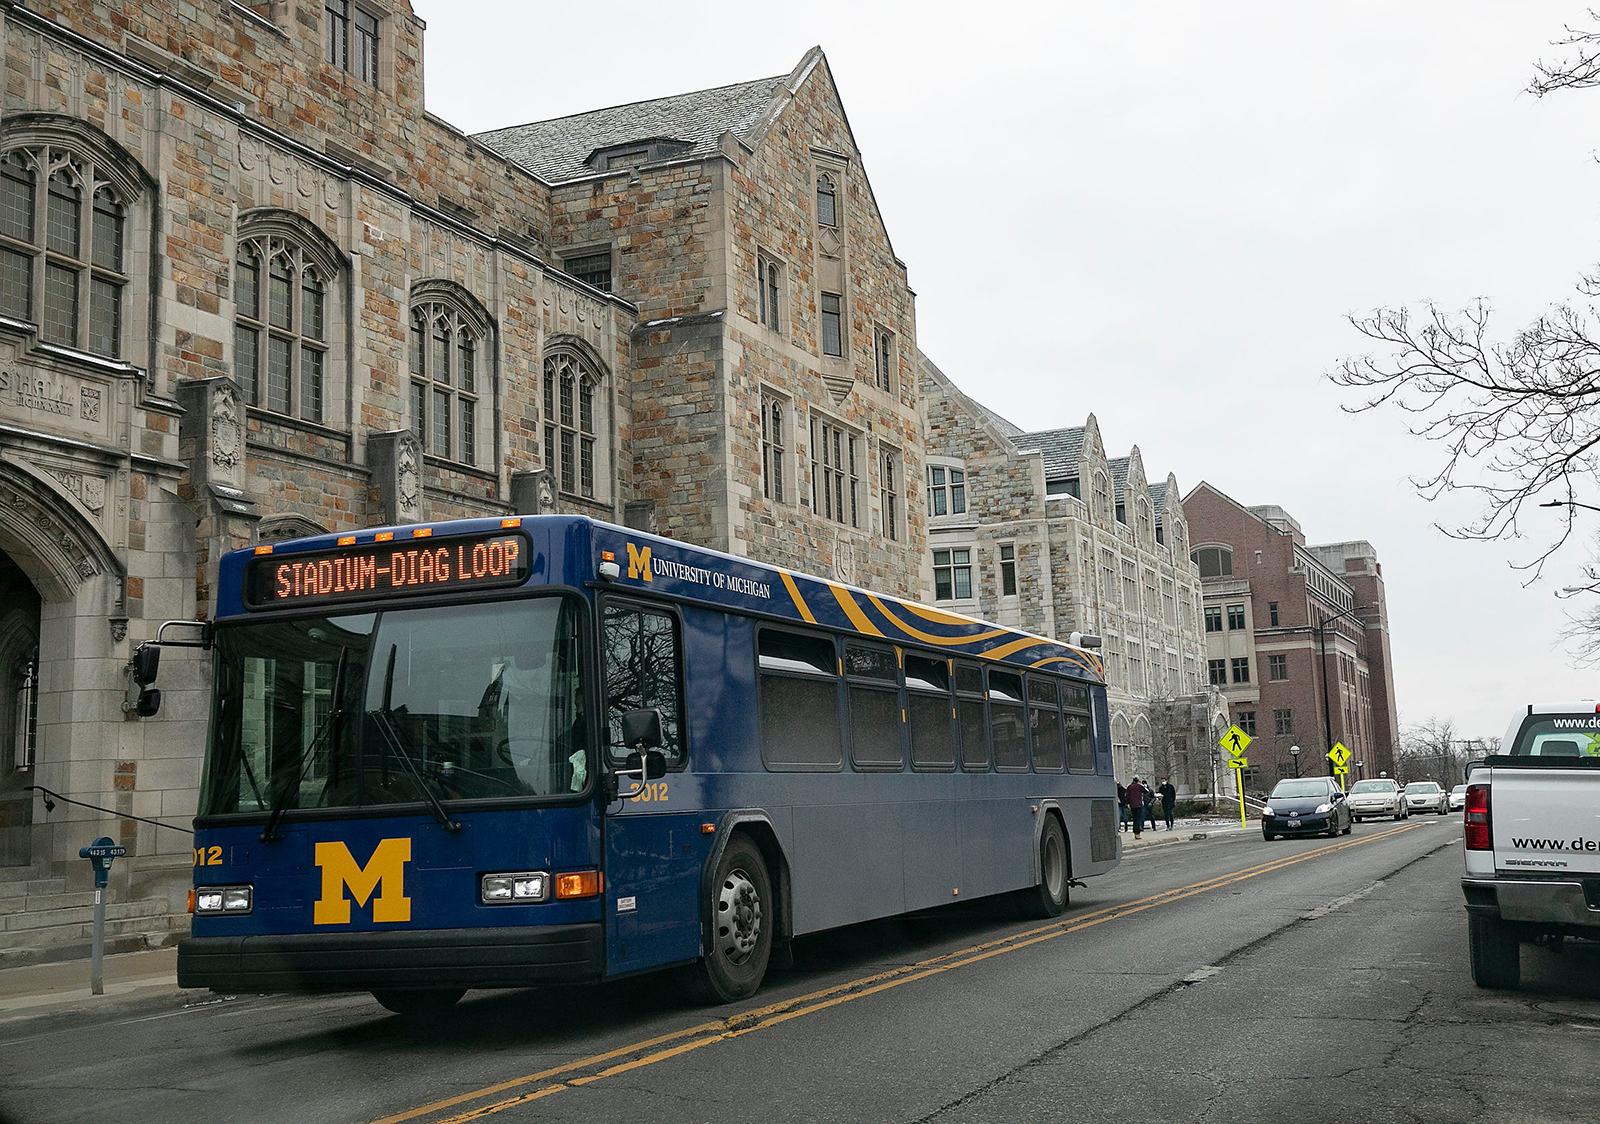 A University of Michigan bus makes its way around campus on Monday, January 25.